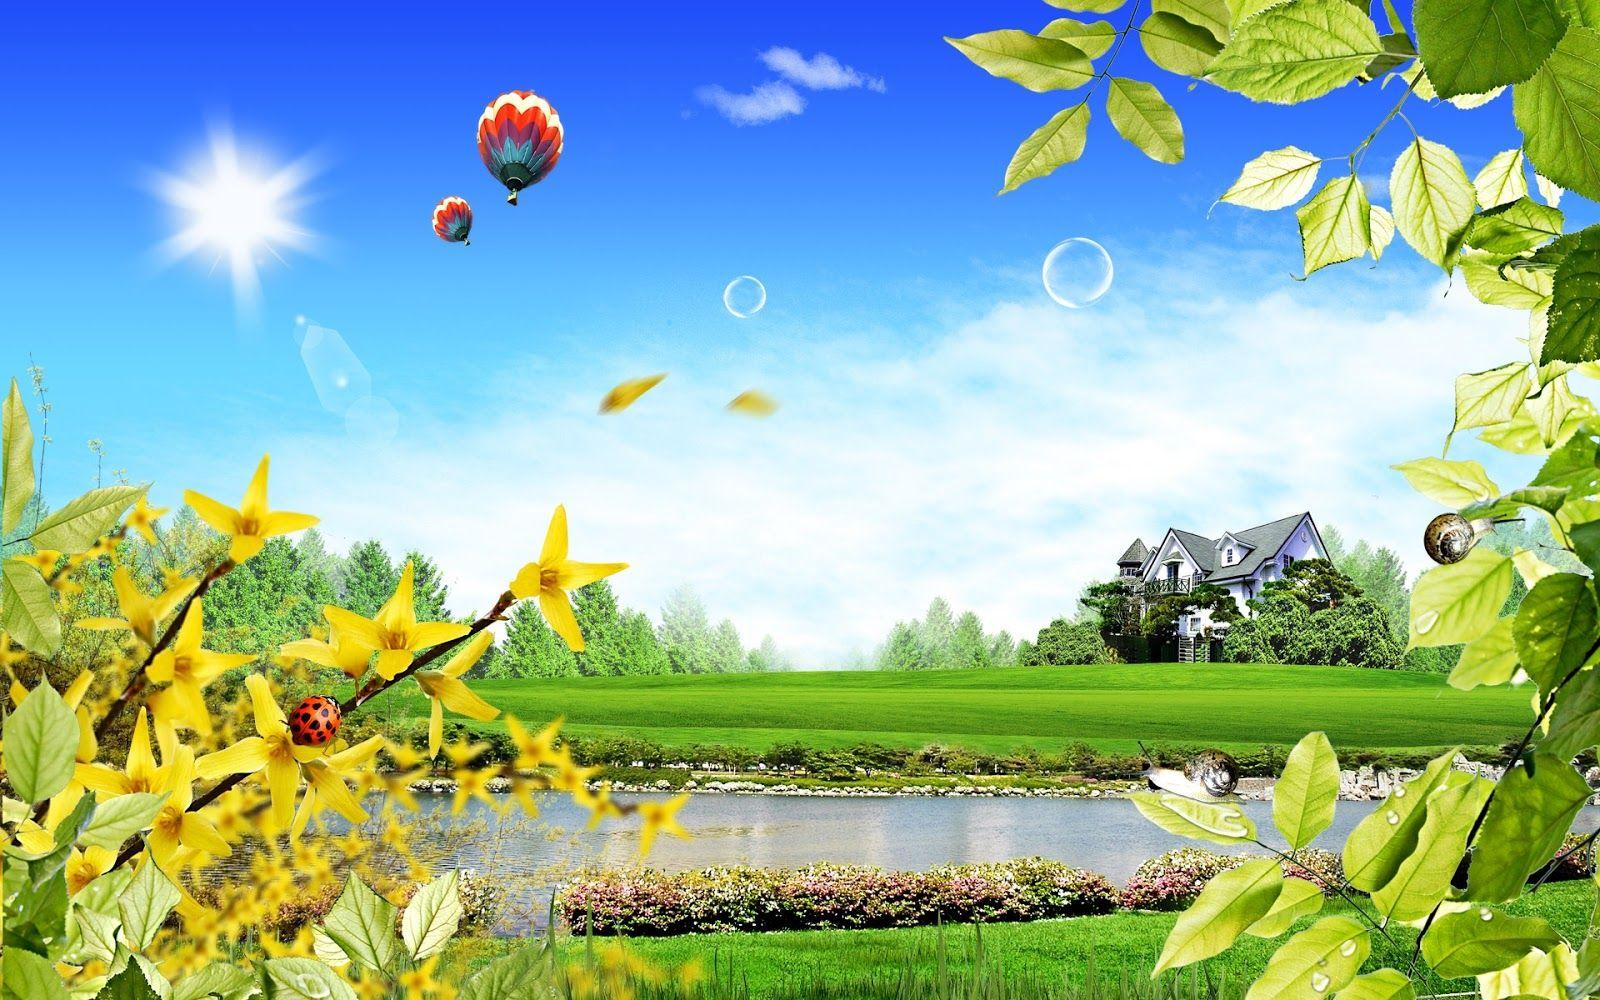 Hinh Nền Laptop 3d đẹp Nhất Hd Nature Wallpapers Beautiful Wallpapers Backgrounds Nature Wallpaper